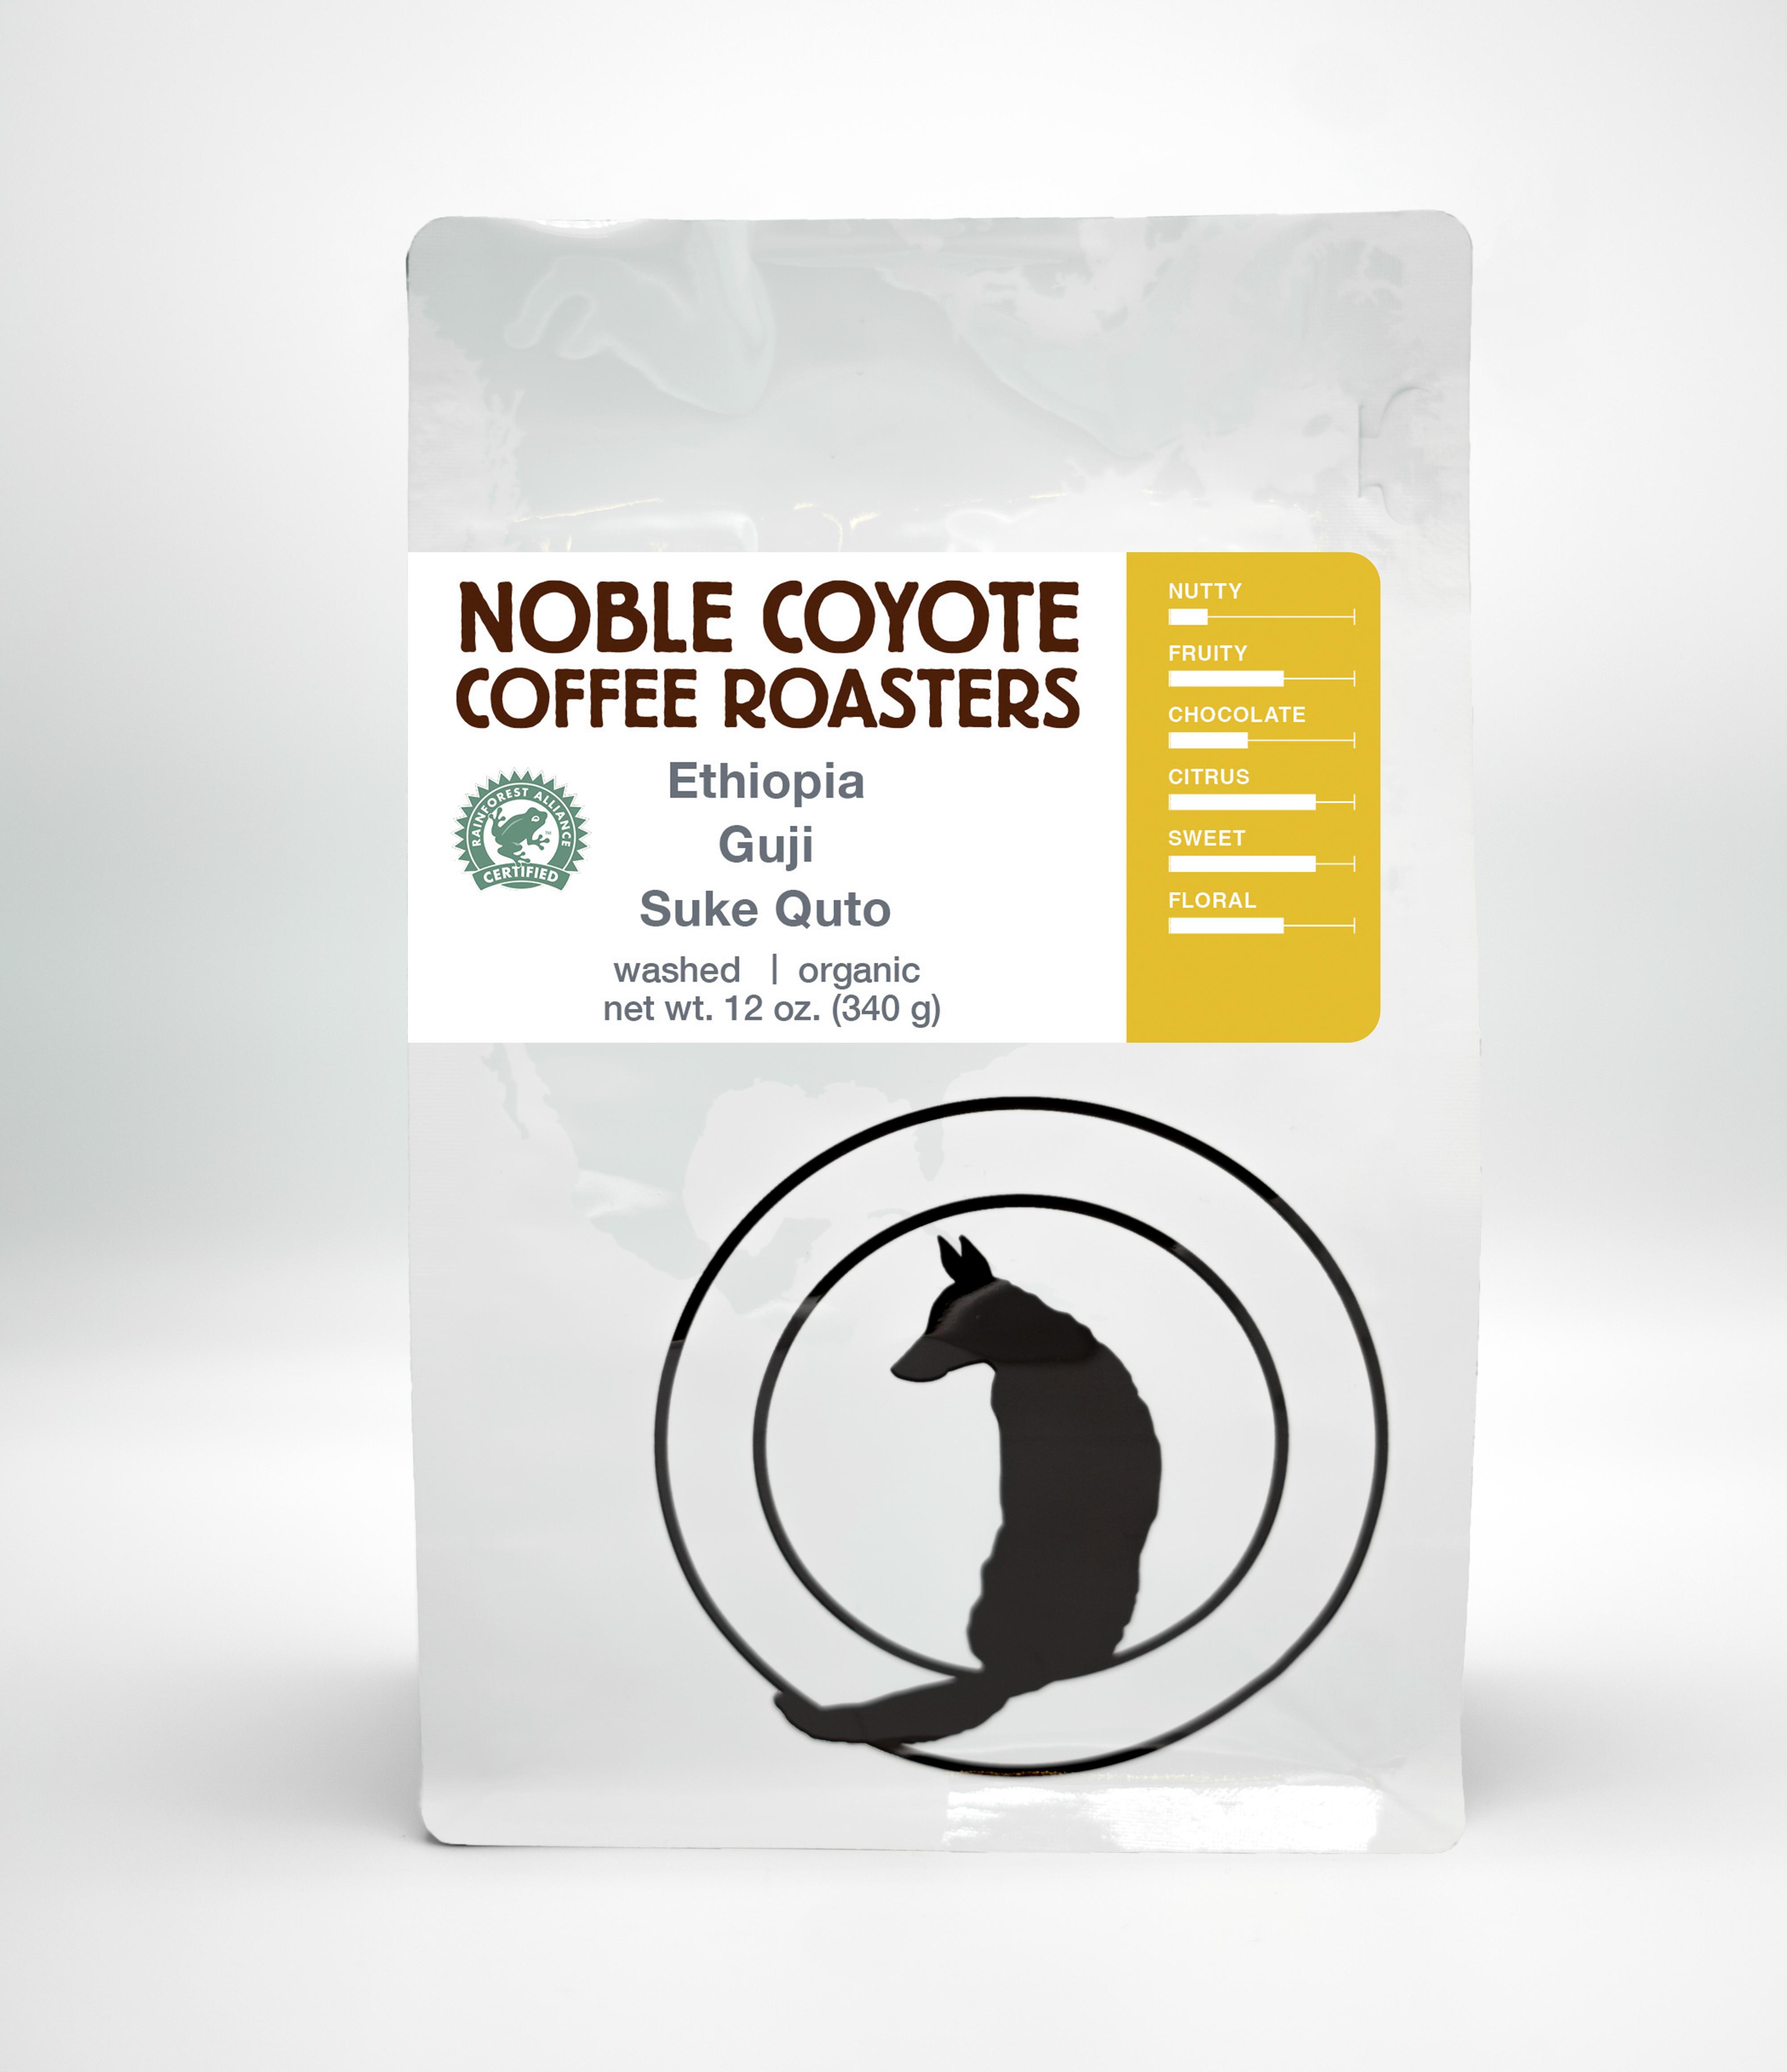 Ethiopia Suke Quto from Noble Coyote Coffee Roasters